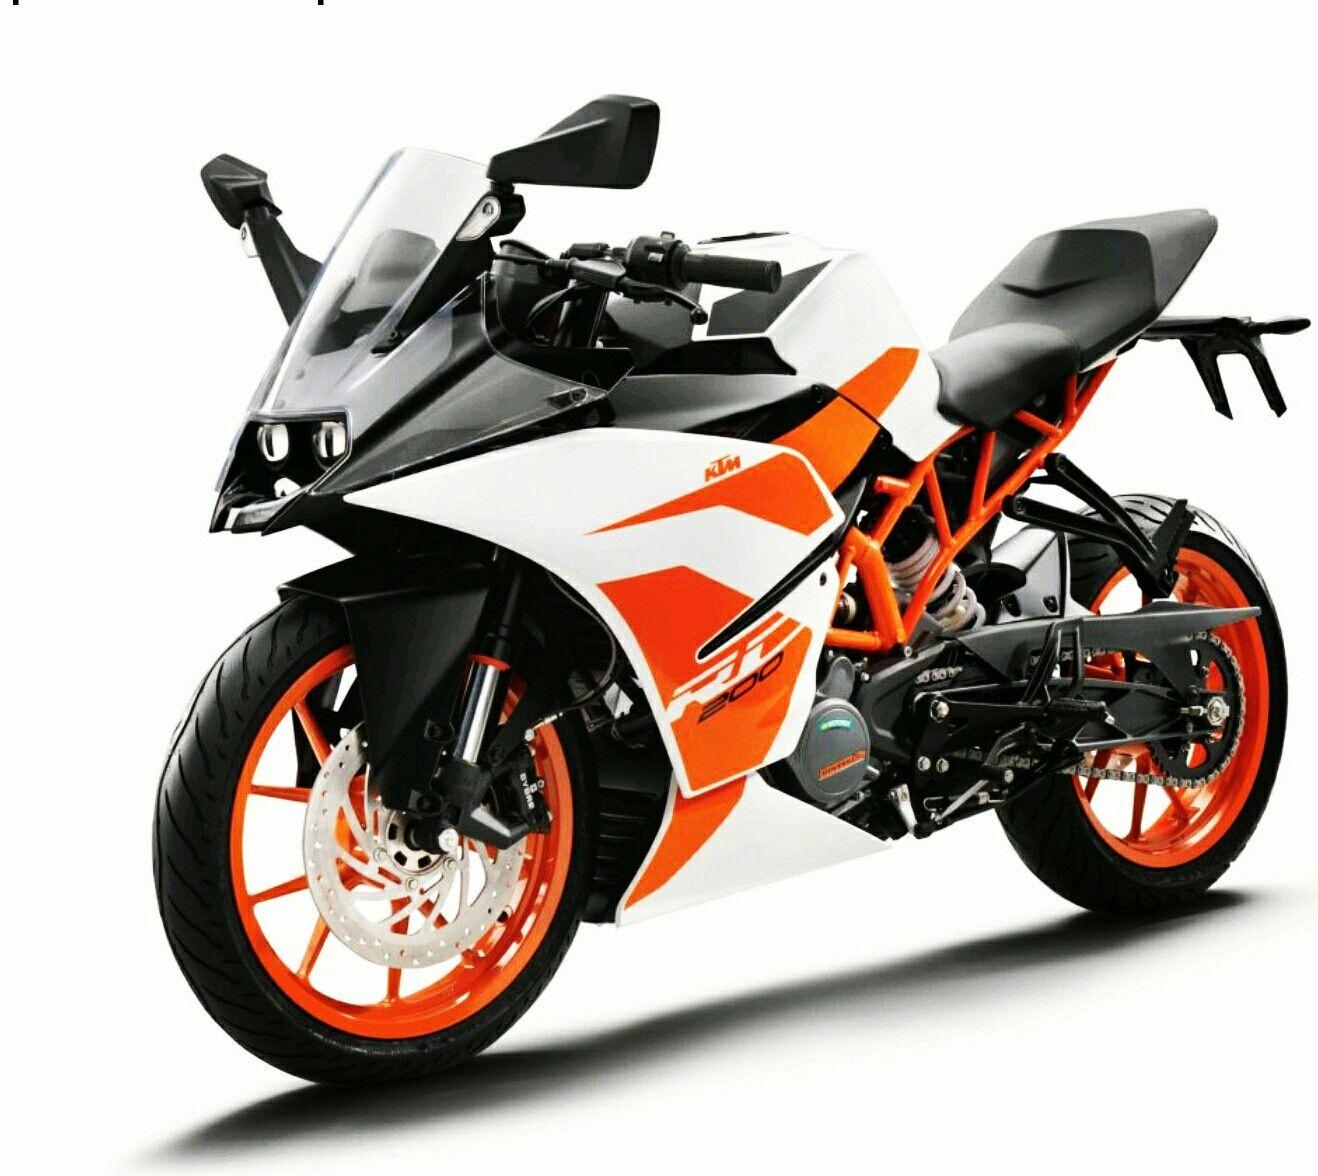 Ktm Rc 200 2017 Ktm Rc Ktm Ktm Motorcycles